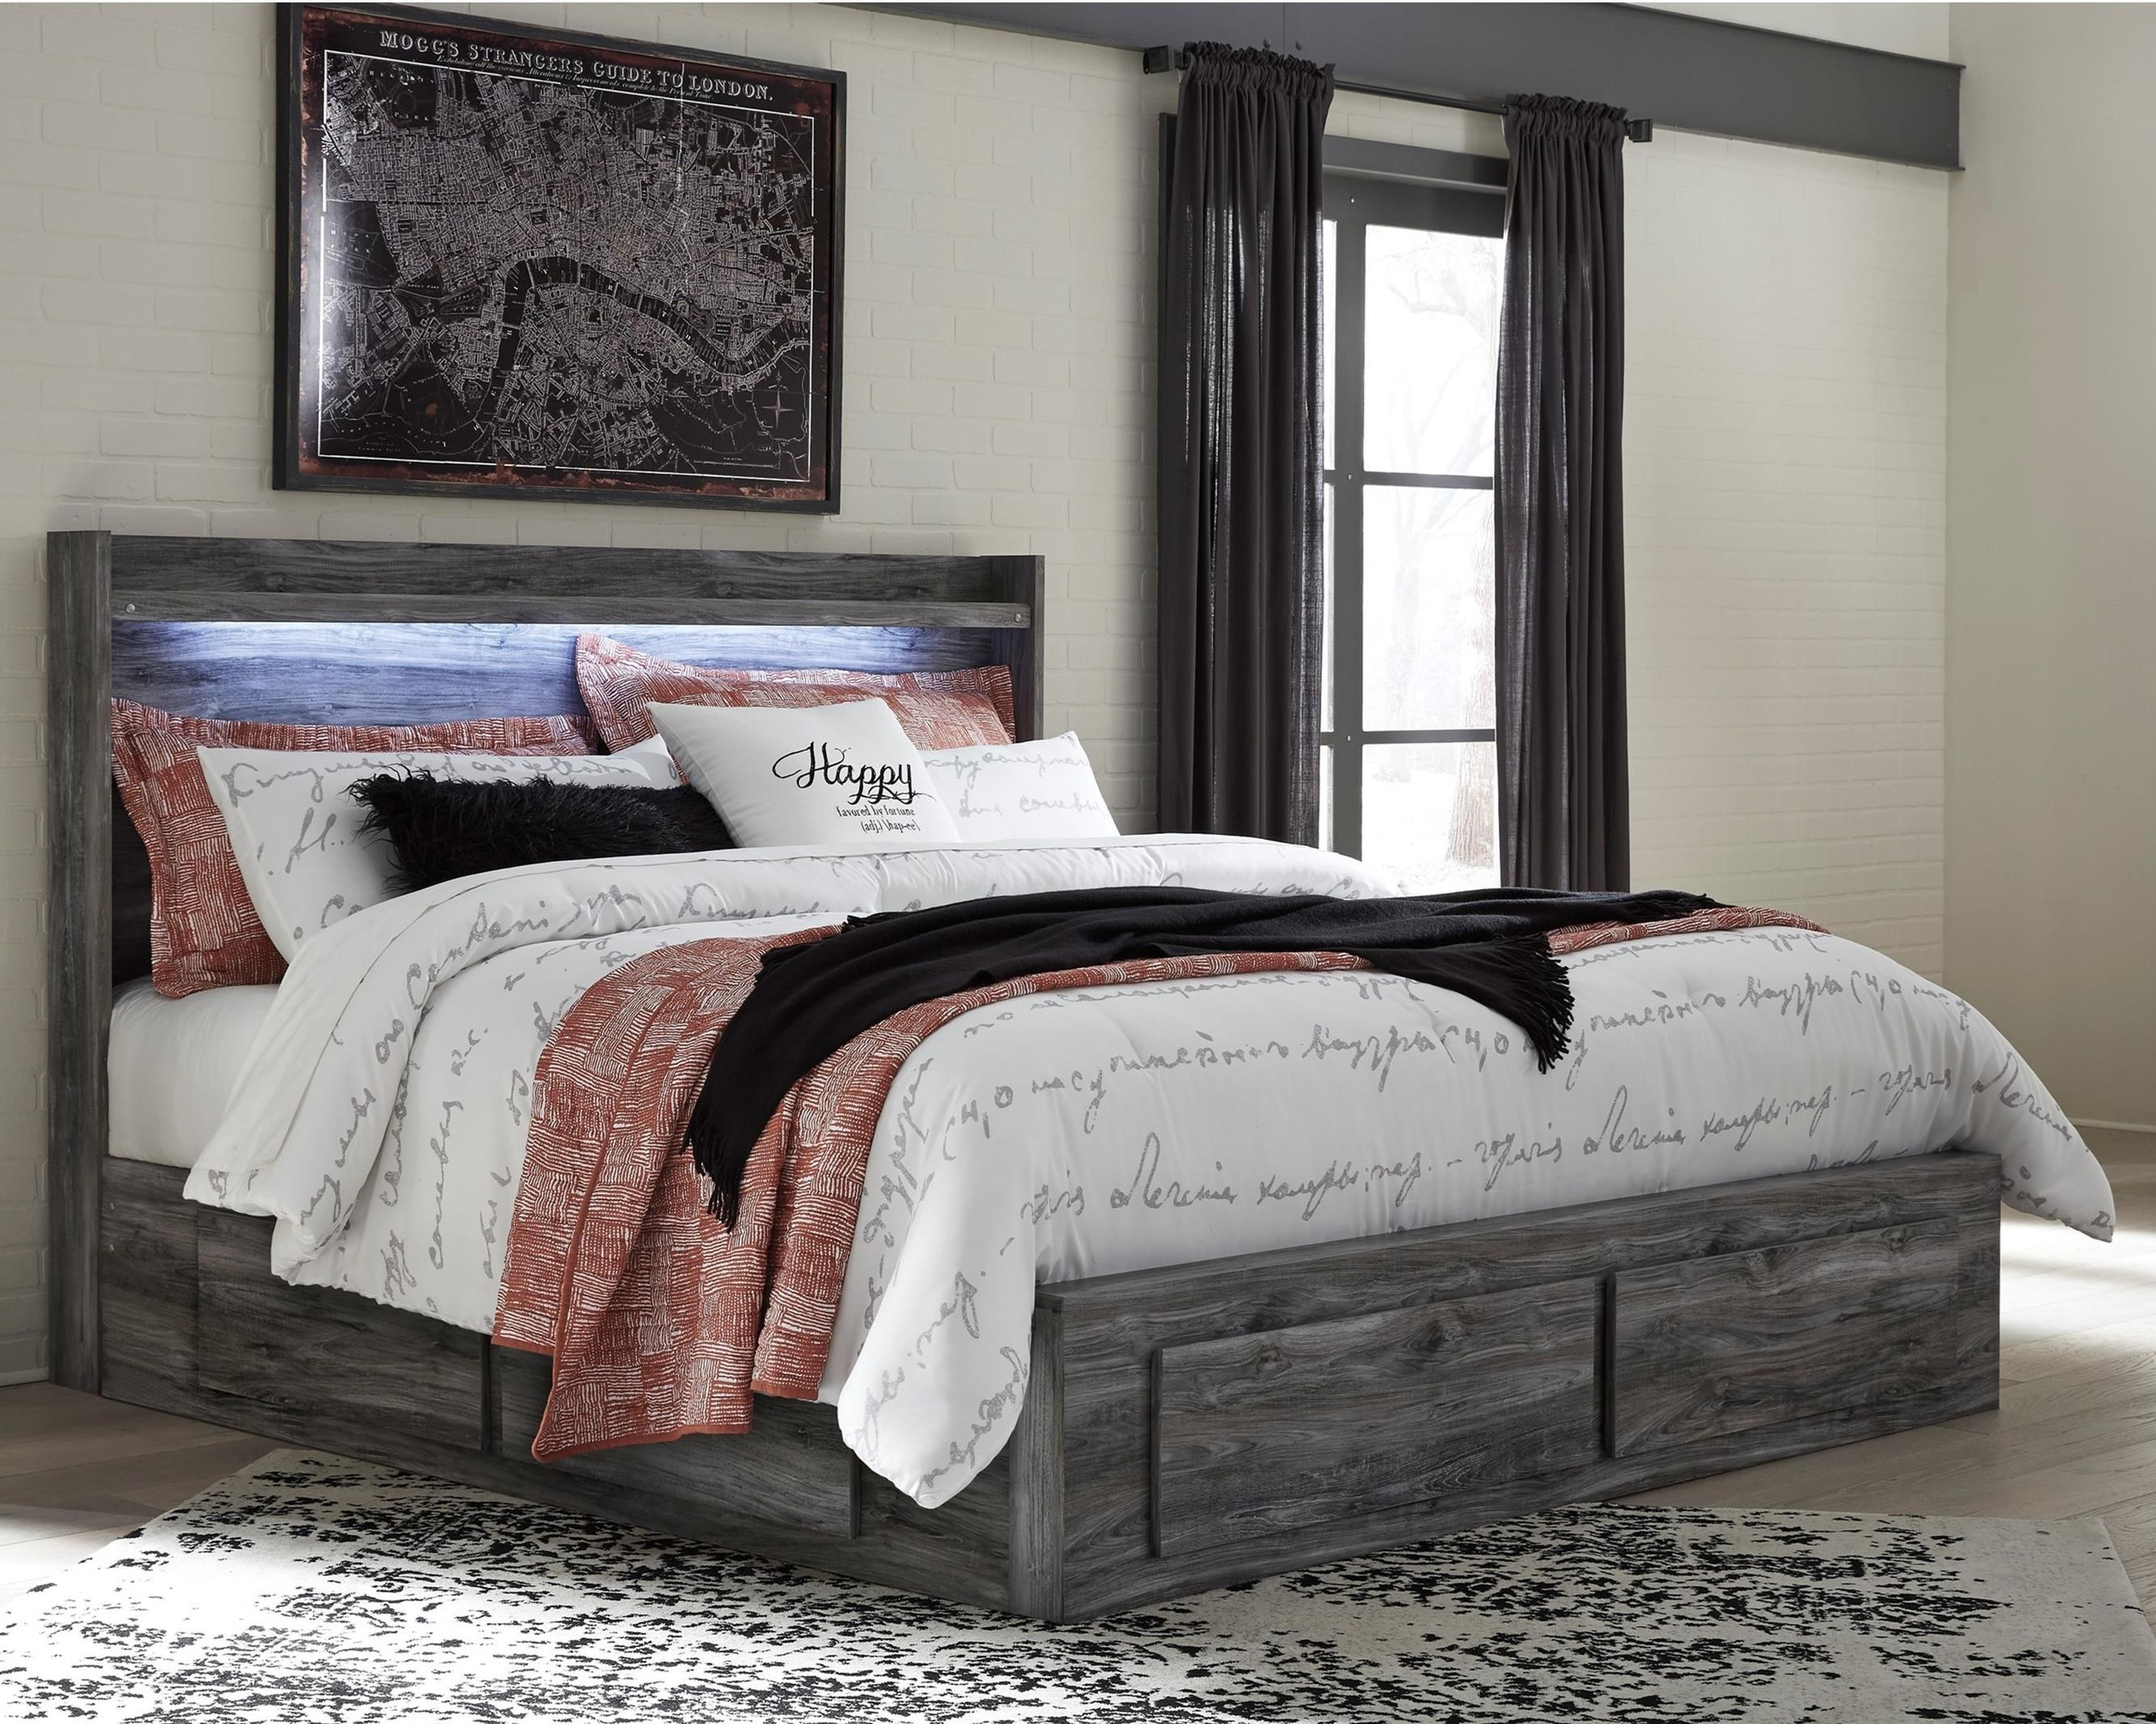 Signature Design by Ashley BaystormKing Storage Bed with 6 Drawers ... & Signature Design by Ashley Baystorm King Storage Bed with 6 Drawers ...